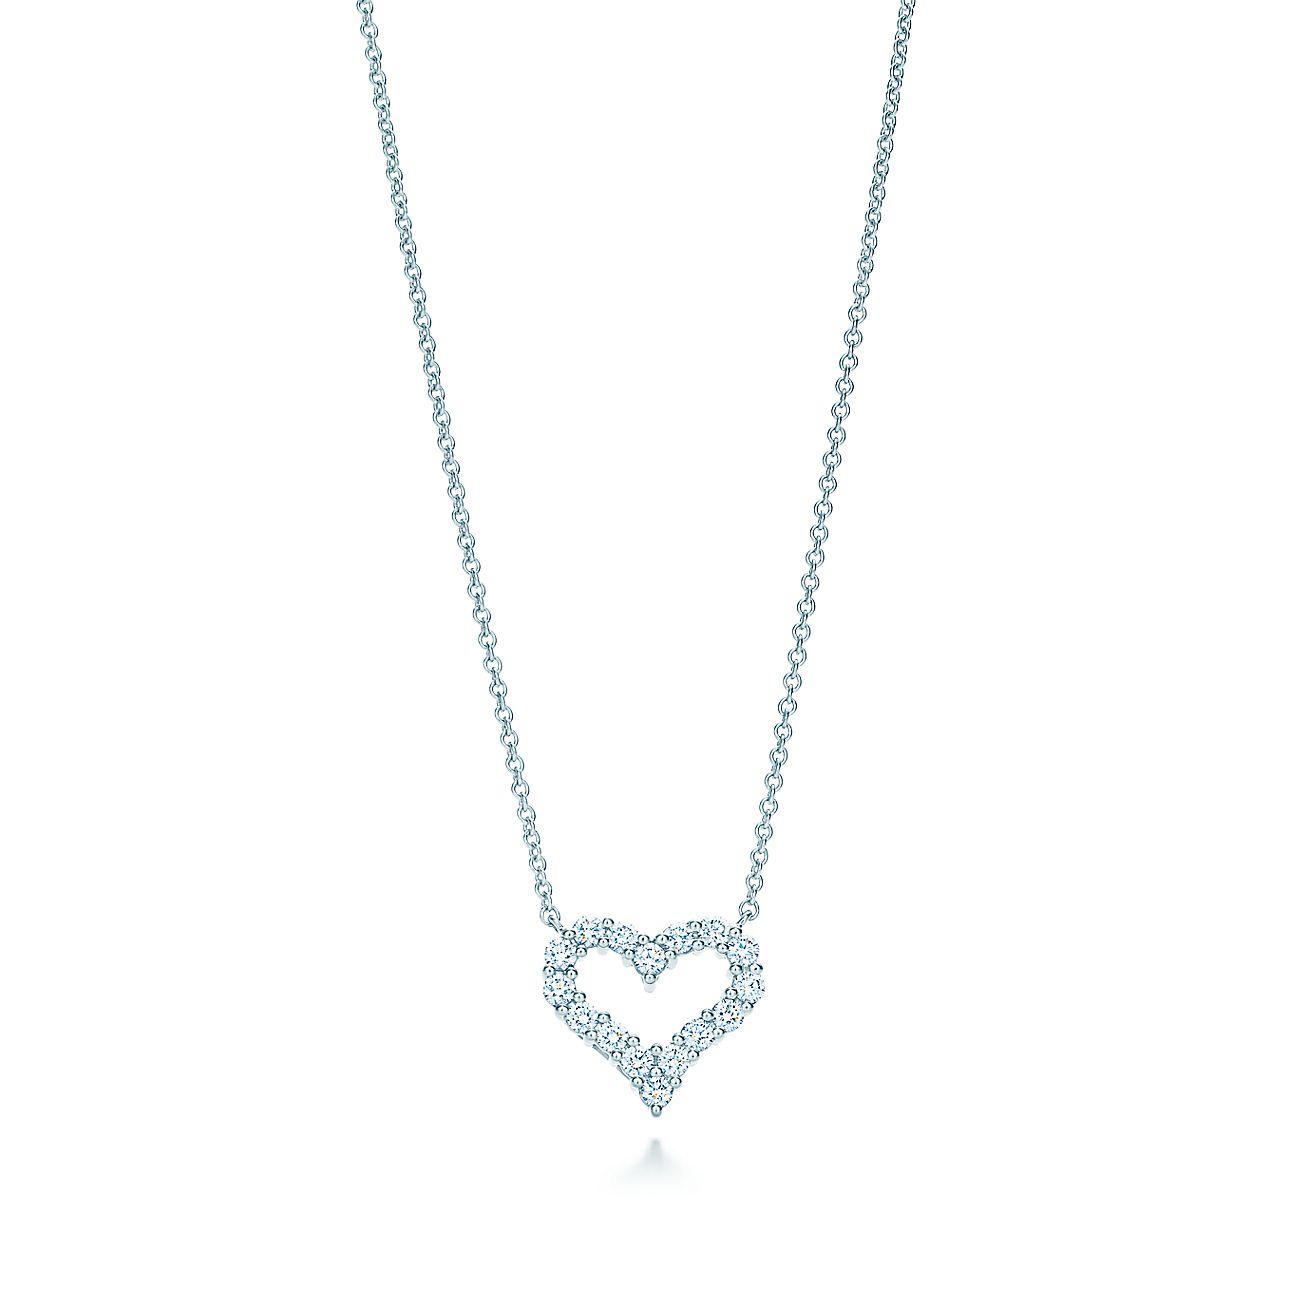 1c396f22a Tiffany Heart Pendant With Diamonds - Pendant Design Ideas